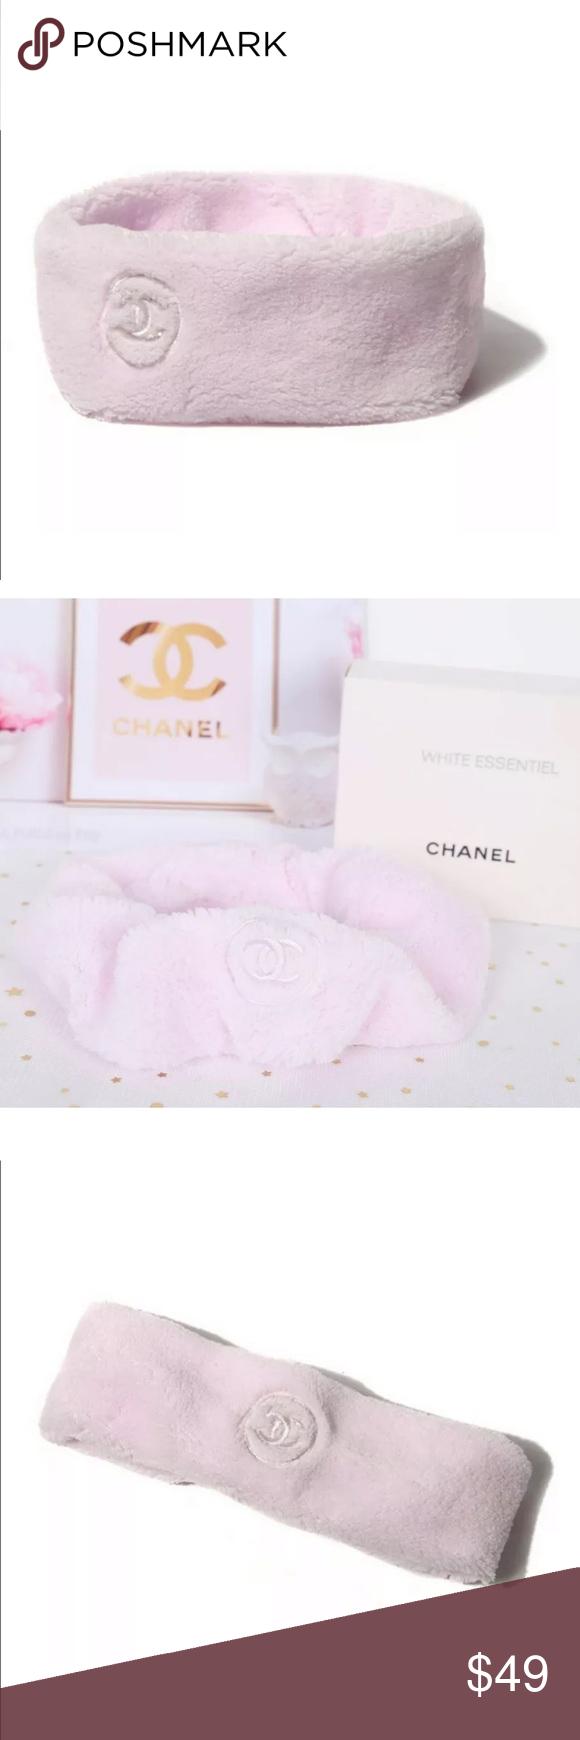 CHANEL Yoga Fleece Hairband Plush Skincare CC CHANEL Yoga Fleece Hairband Plush ...  #Chanel #Fleece #Hairband #Plush #Skincare #Yoga